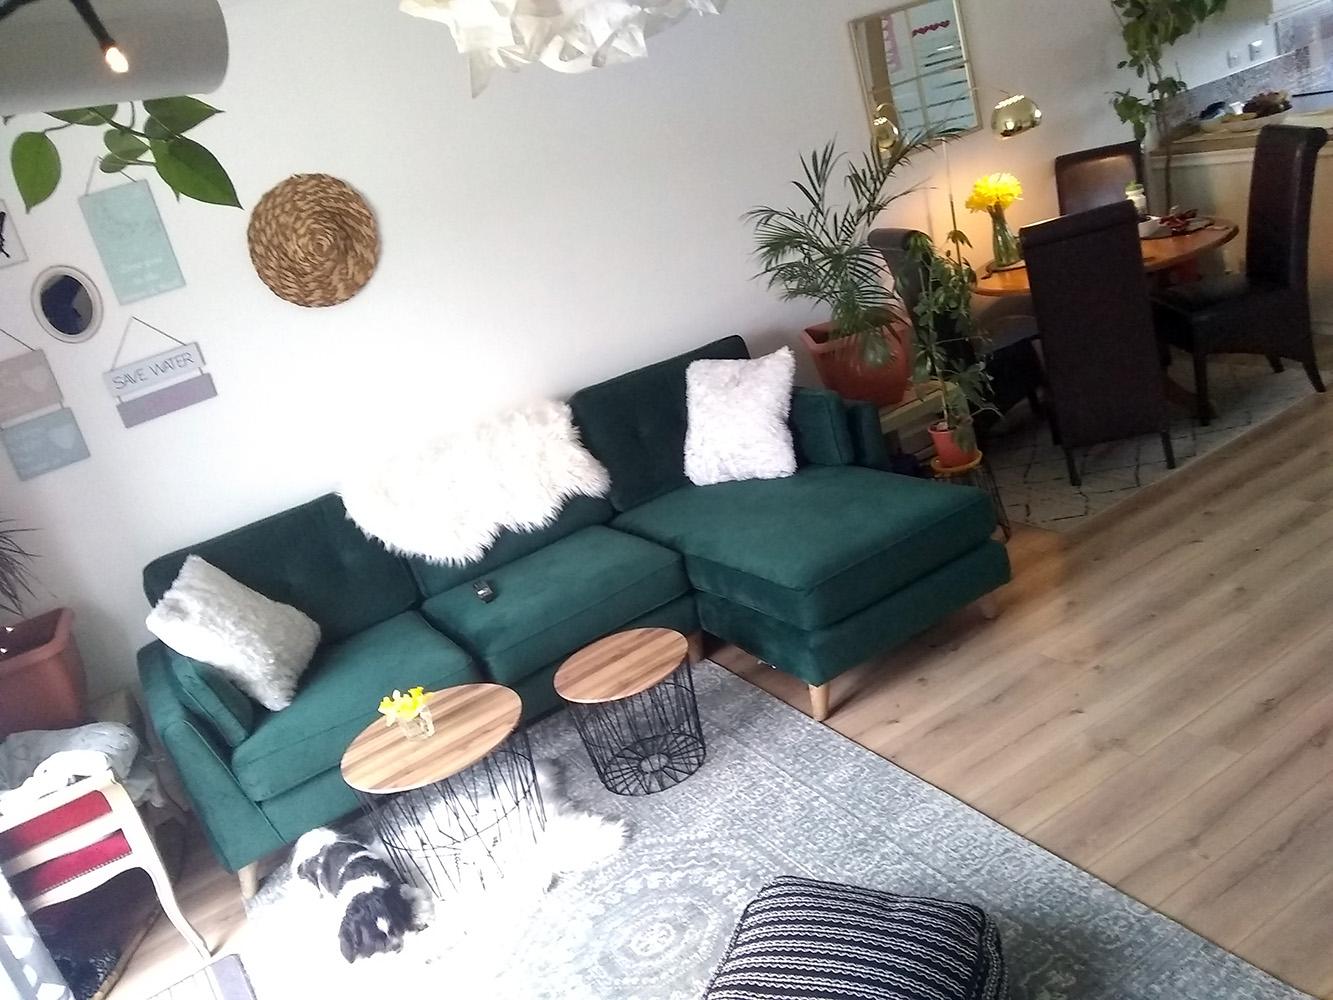 Green Magnus corner sofa from Liga